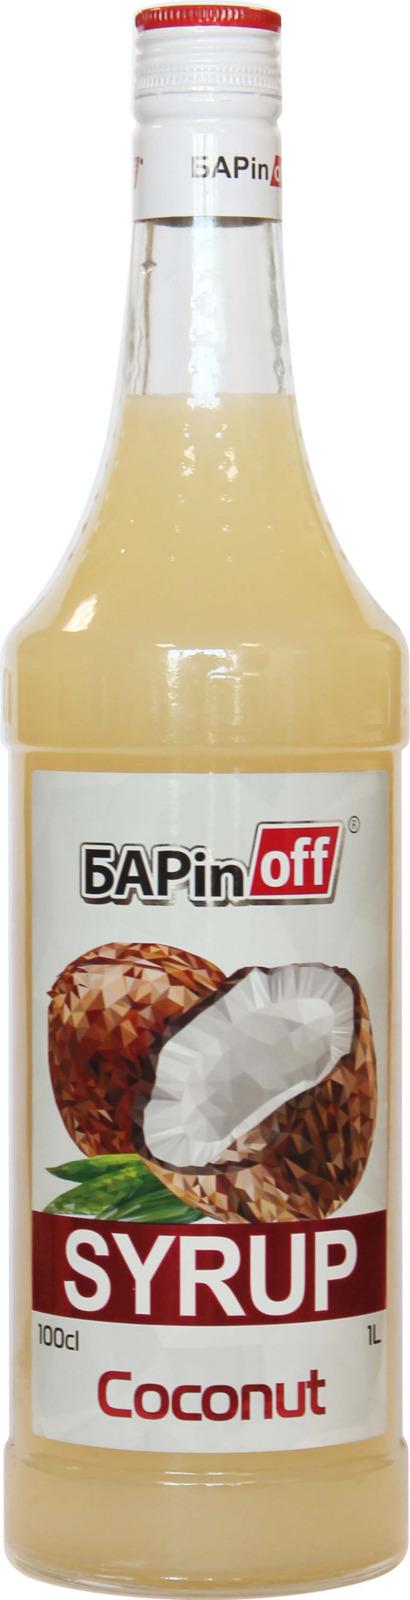 цена на Barinoff Сироп Кокос, 1 л